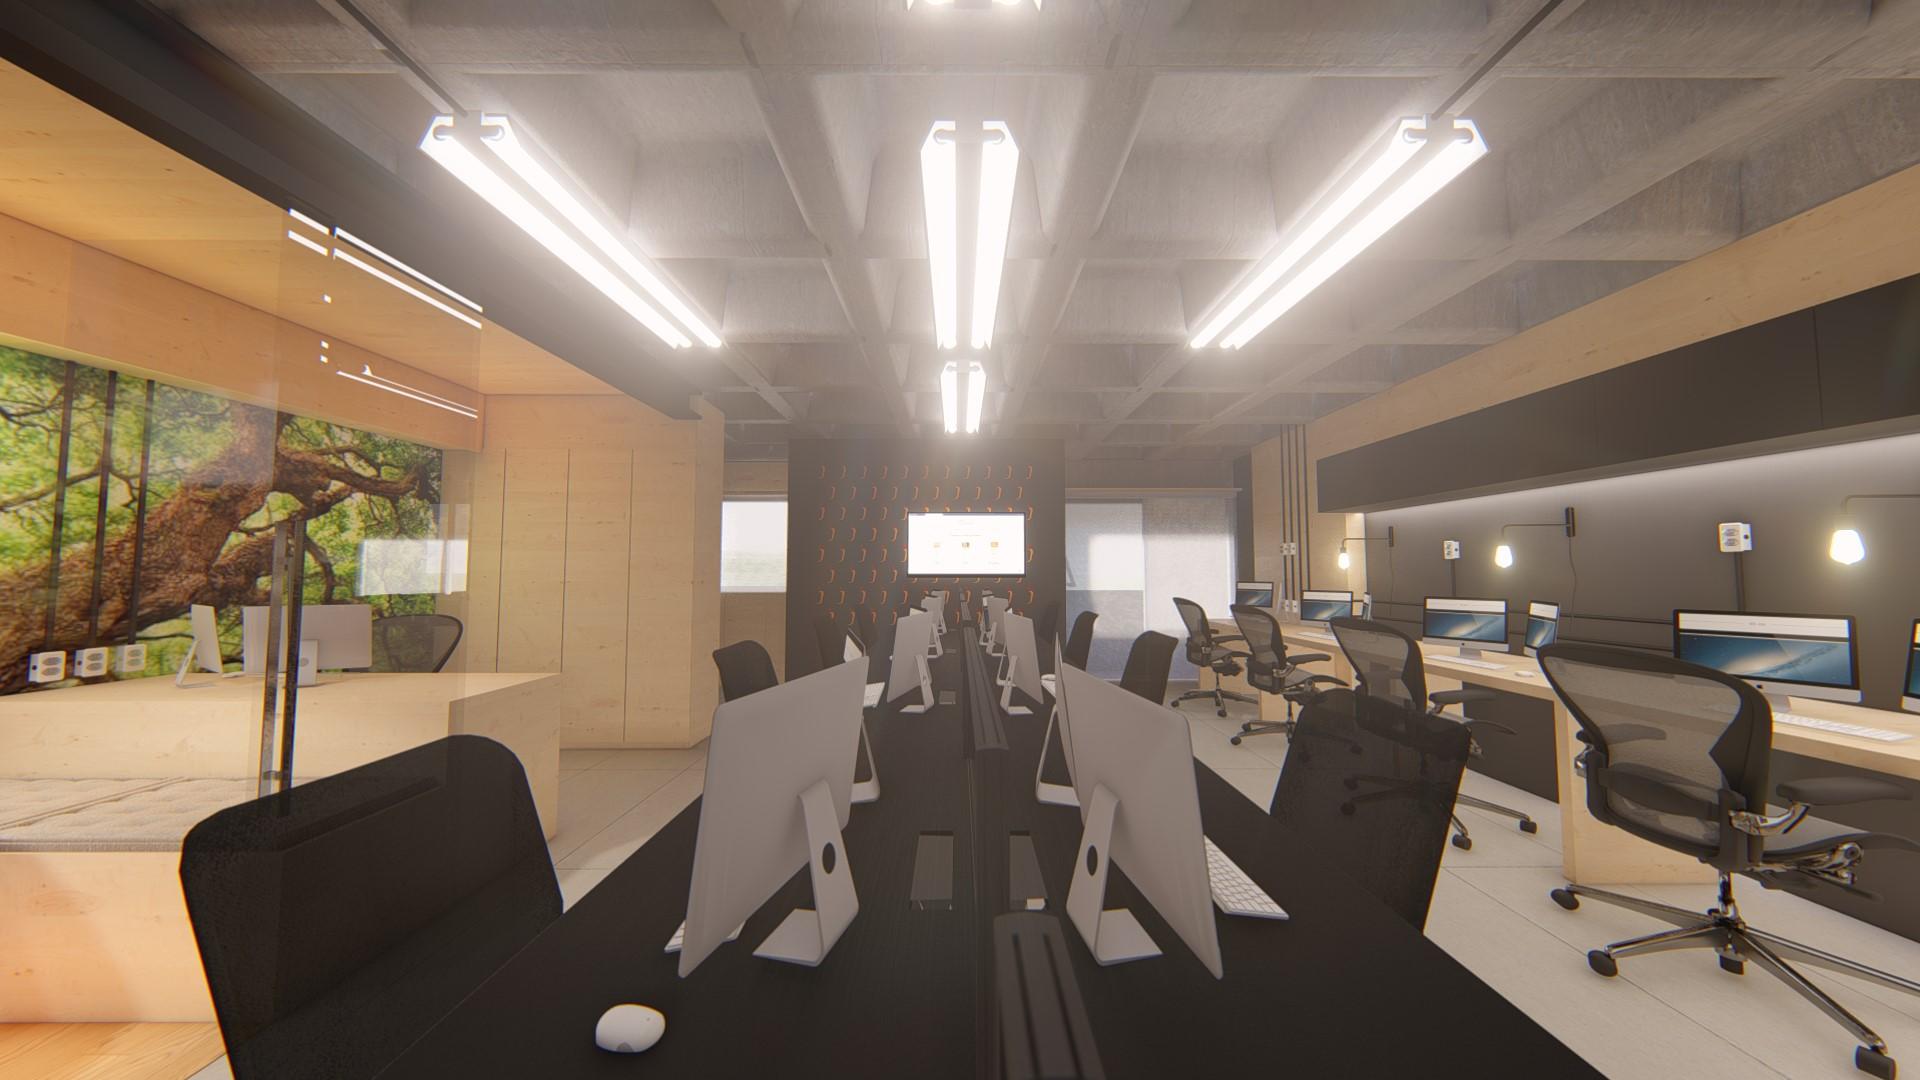 projeto-arquitetonico-cajueiro-duo-arquitetura-027.jpg